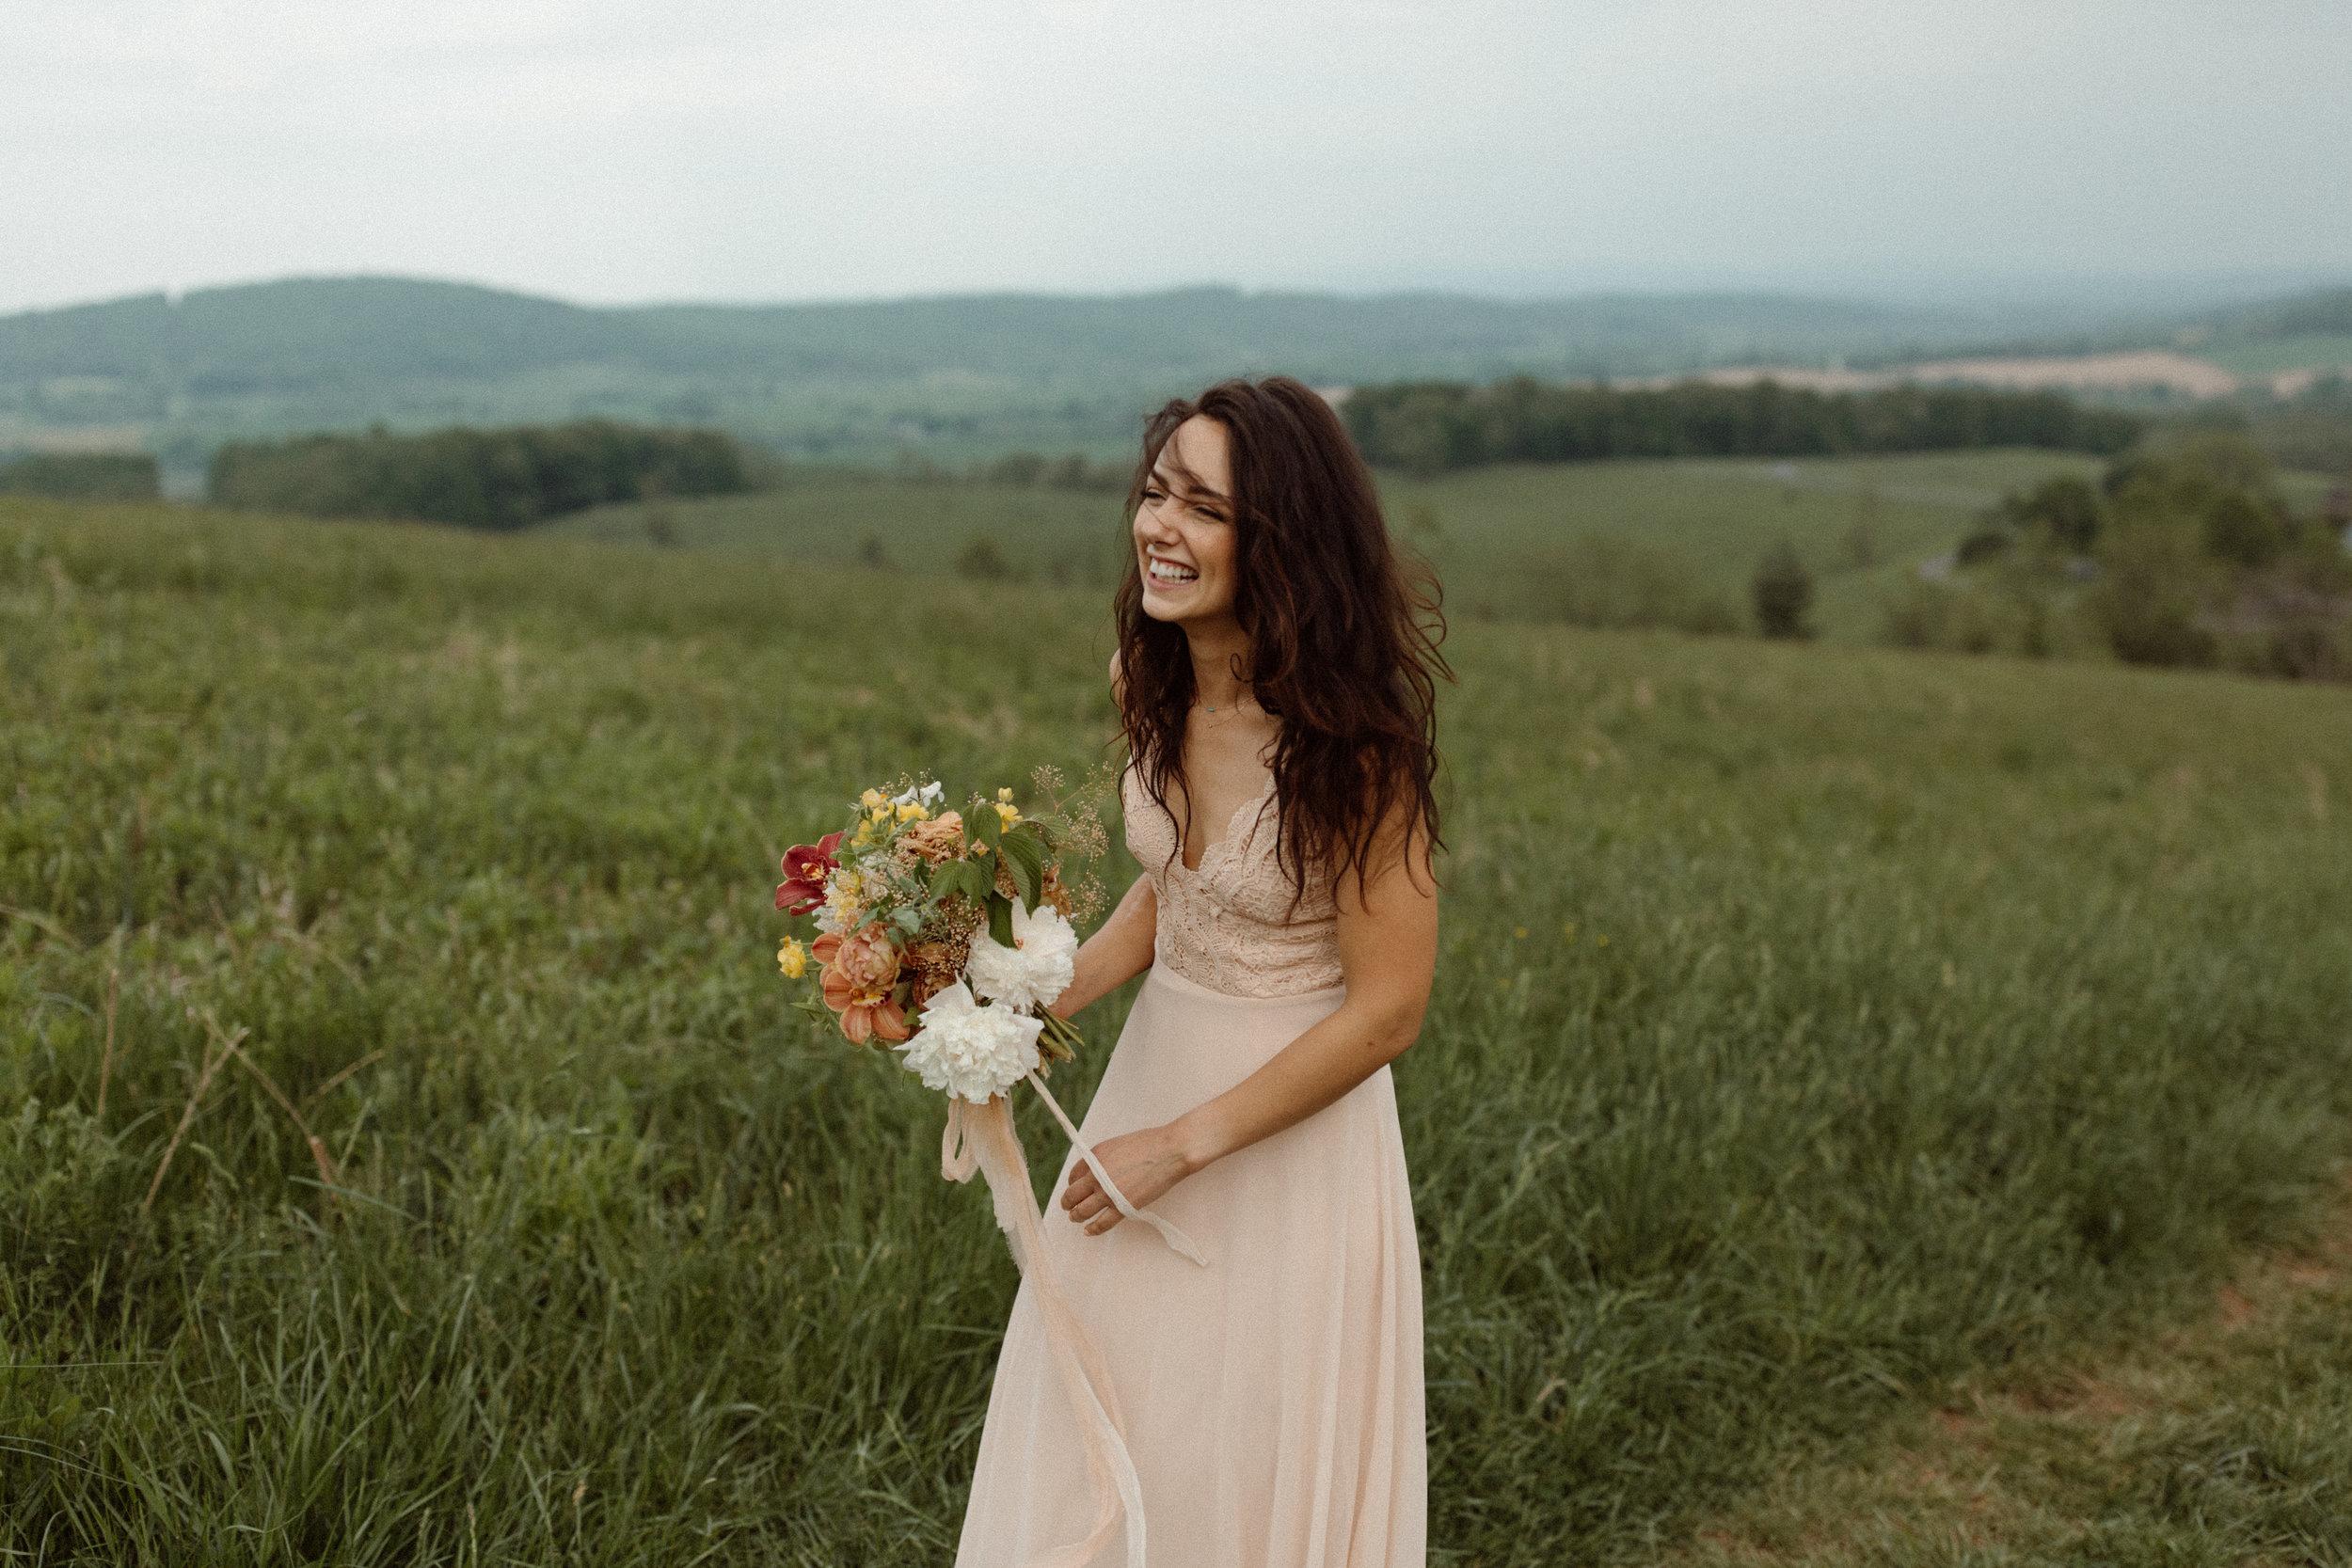 kelsey&mark-engagement-skymeadows-2019-peytoncurry-9542.jpg